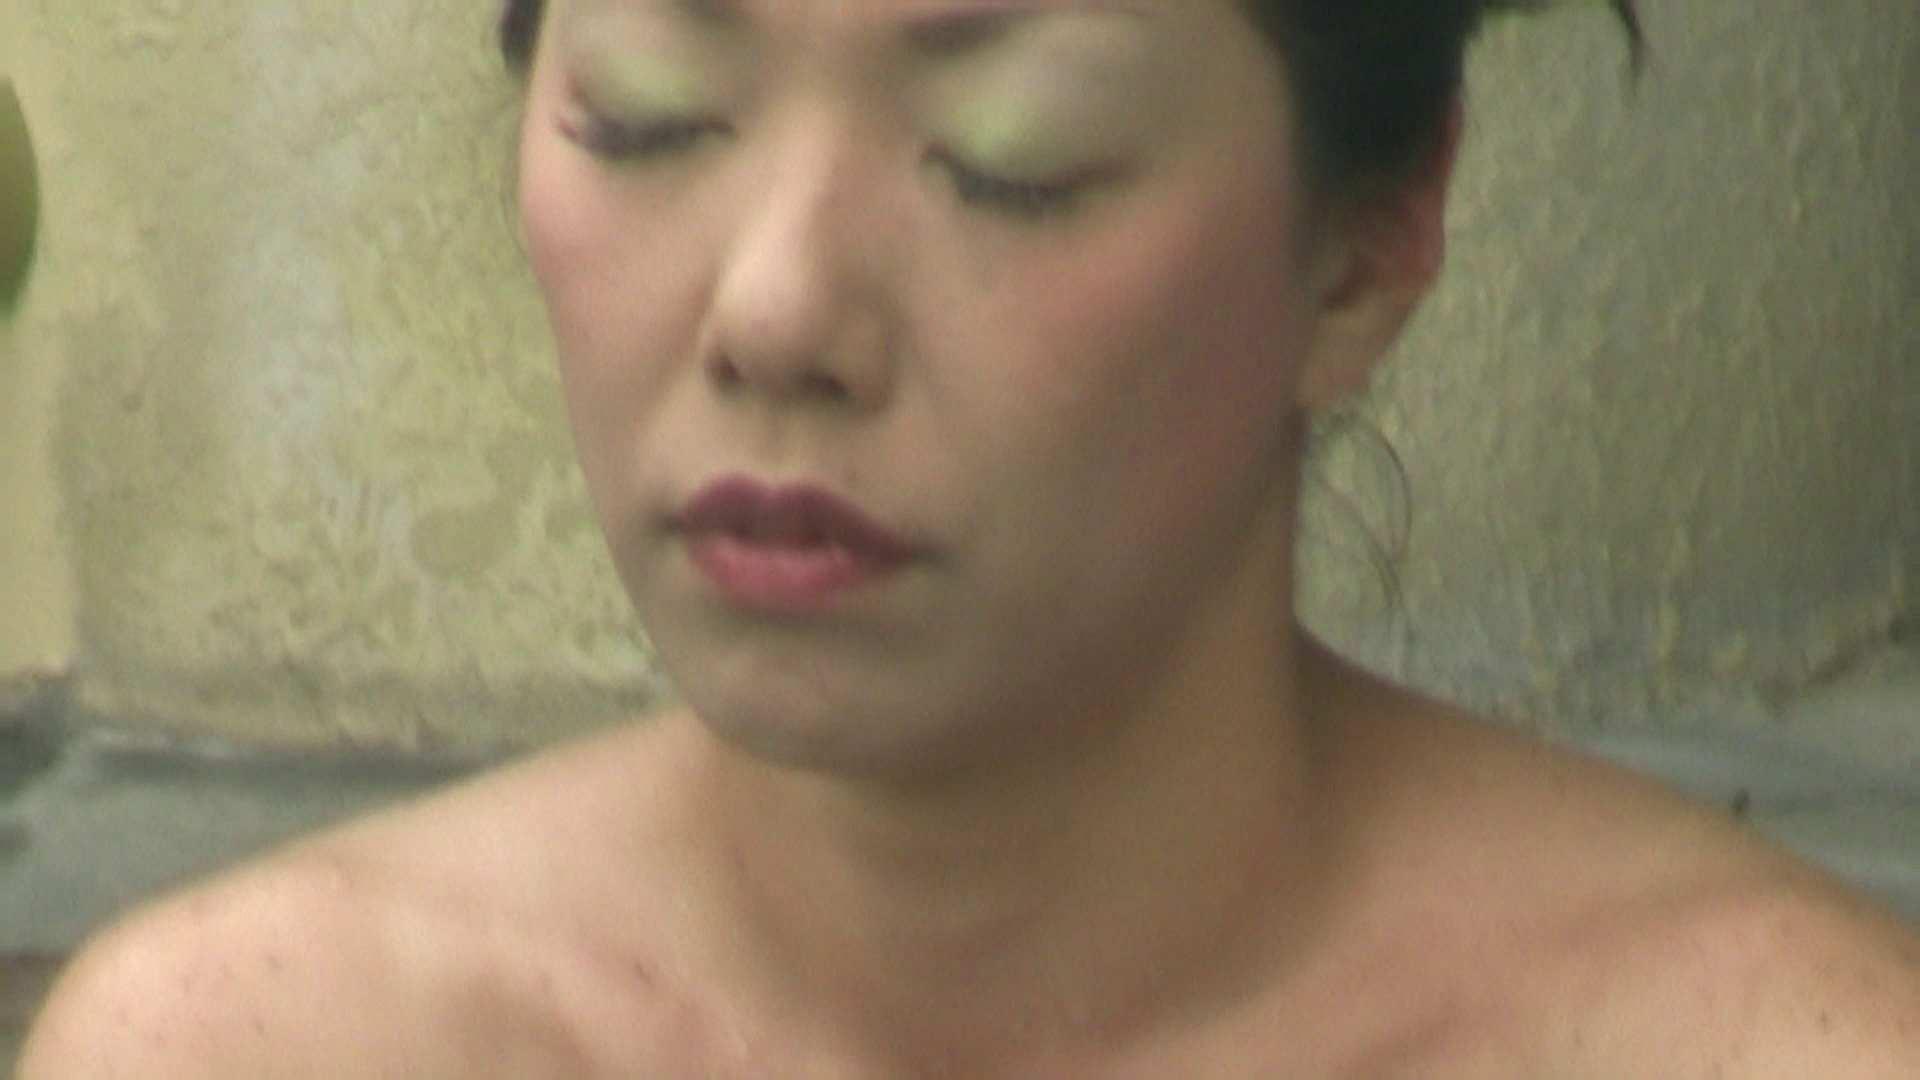 高画質露天女風呂観察 vol.036 望遠 ヌード画像 84pic 69